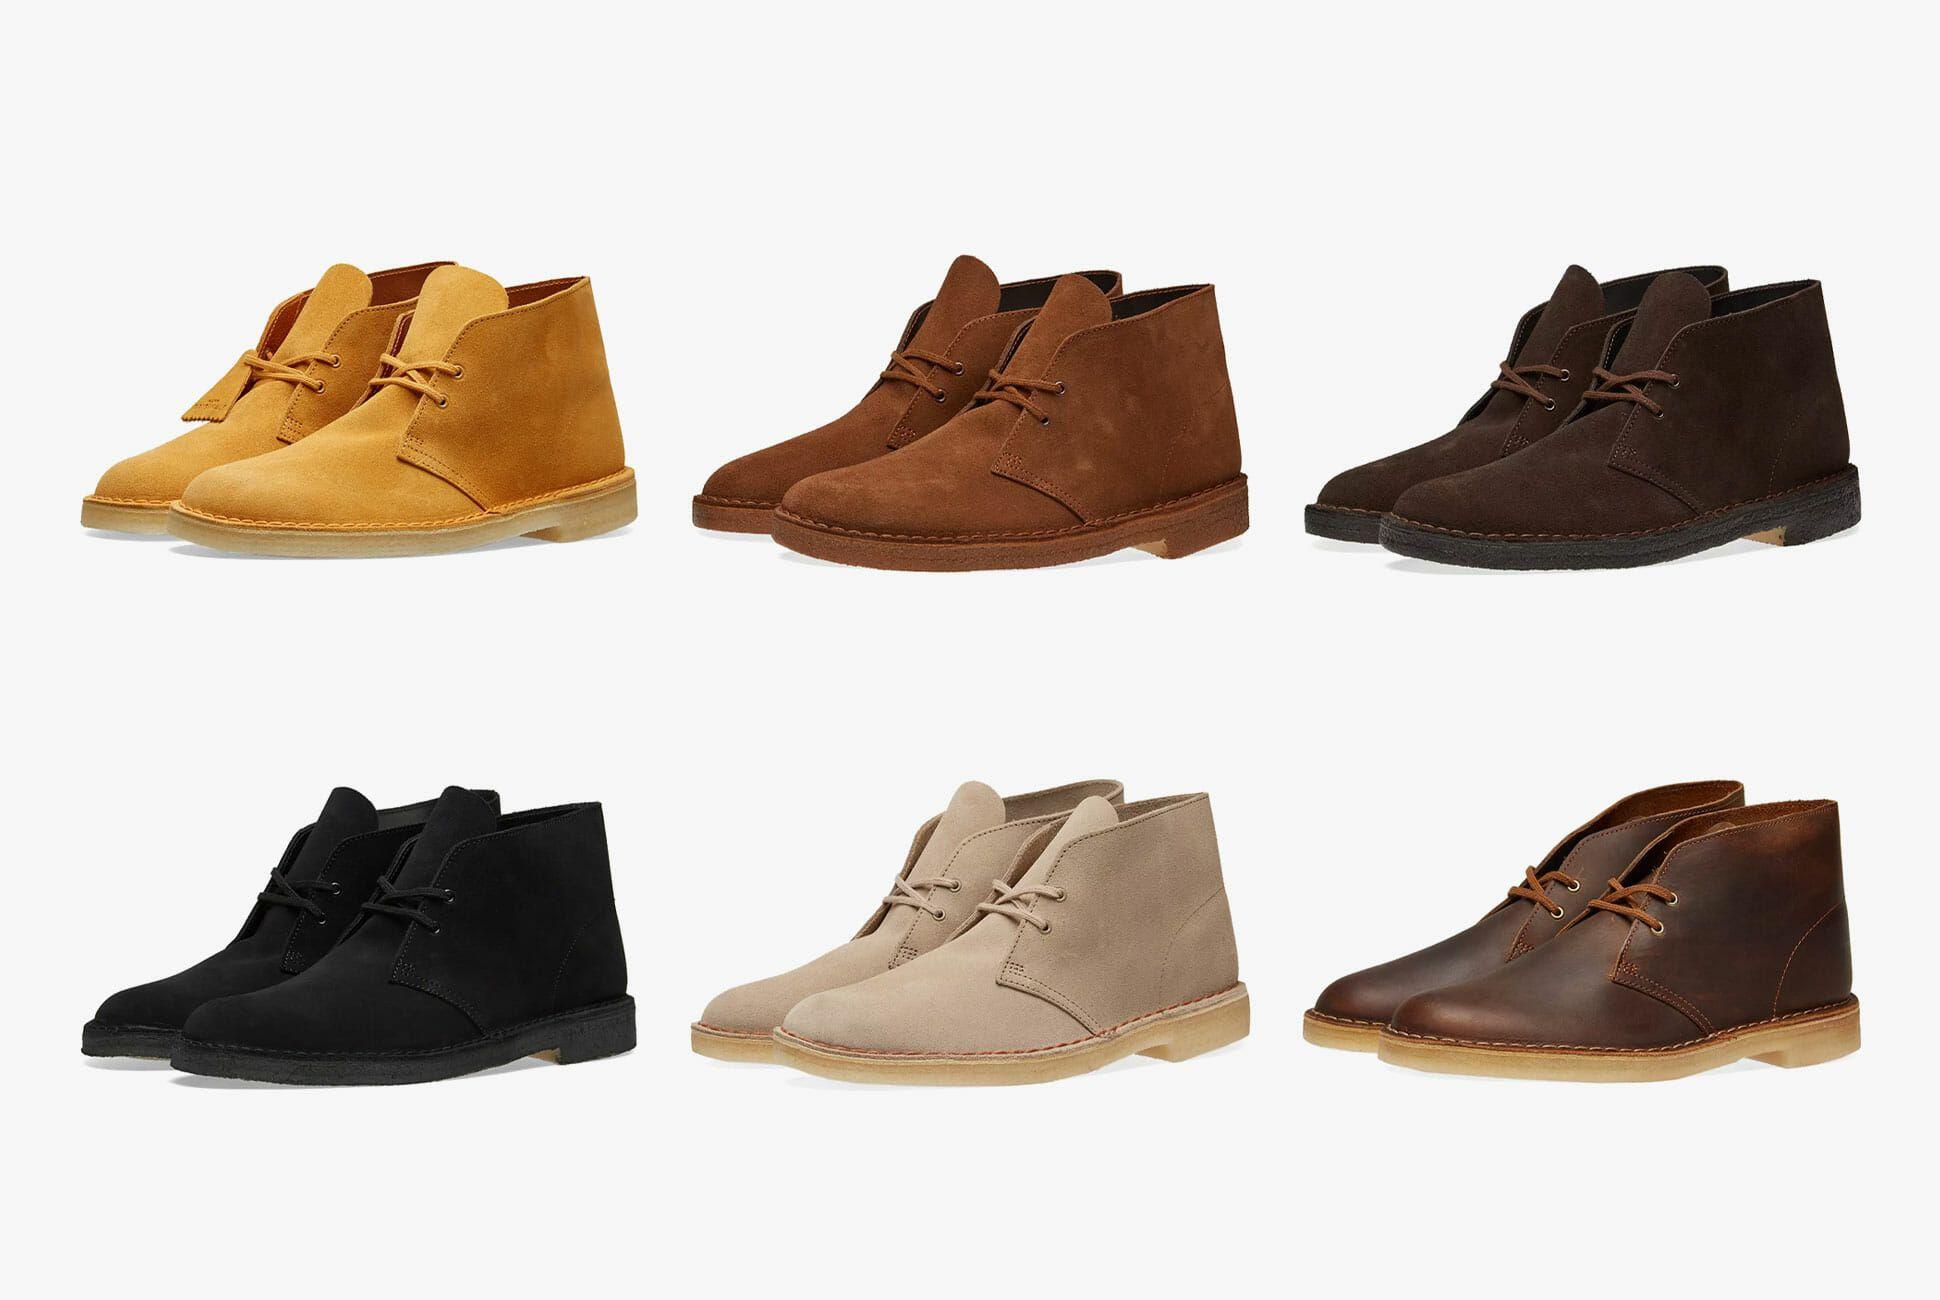 clarks desert boots cola suede sale